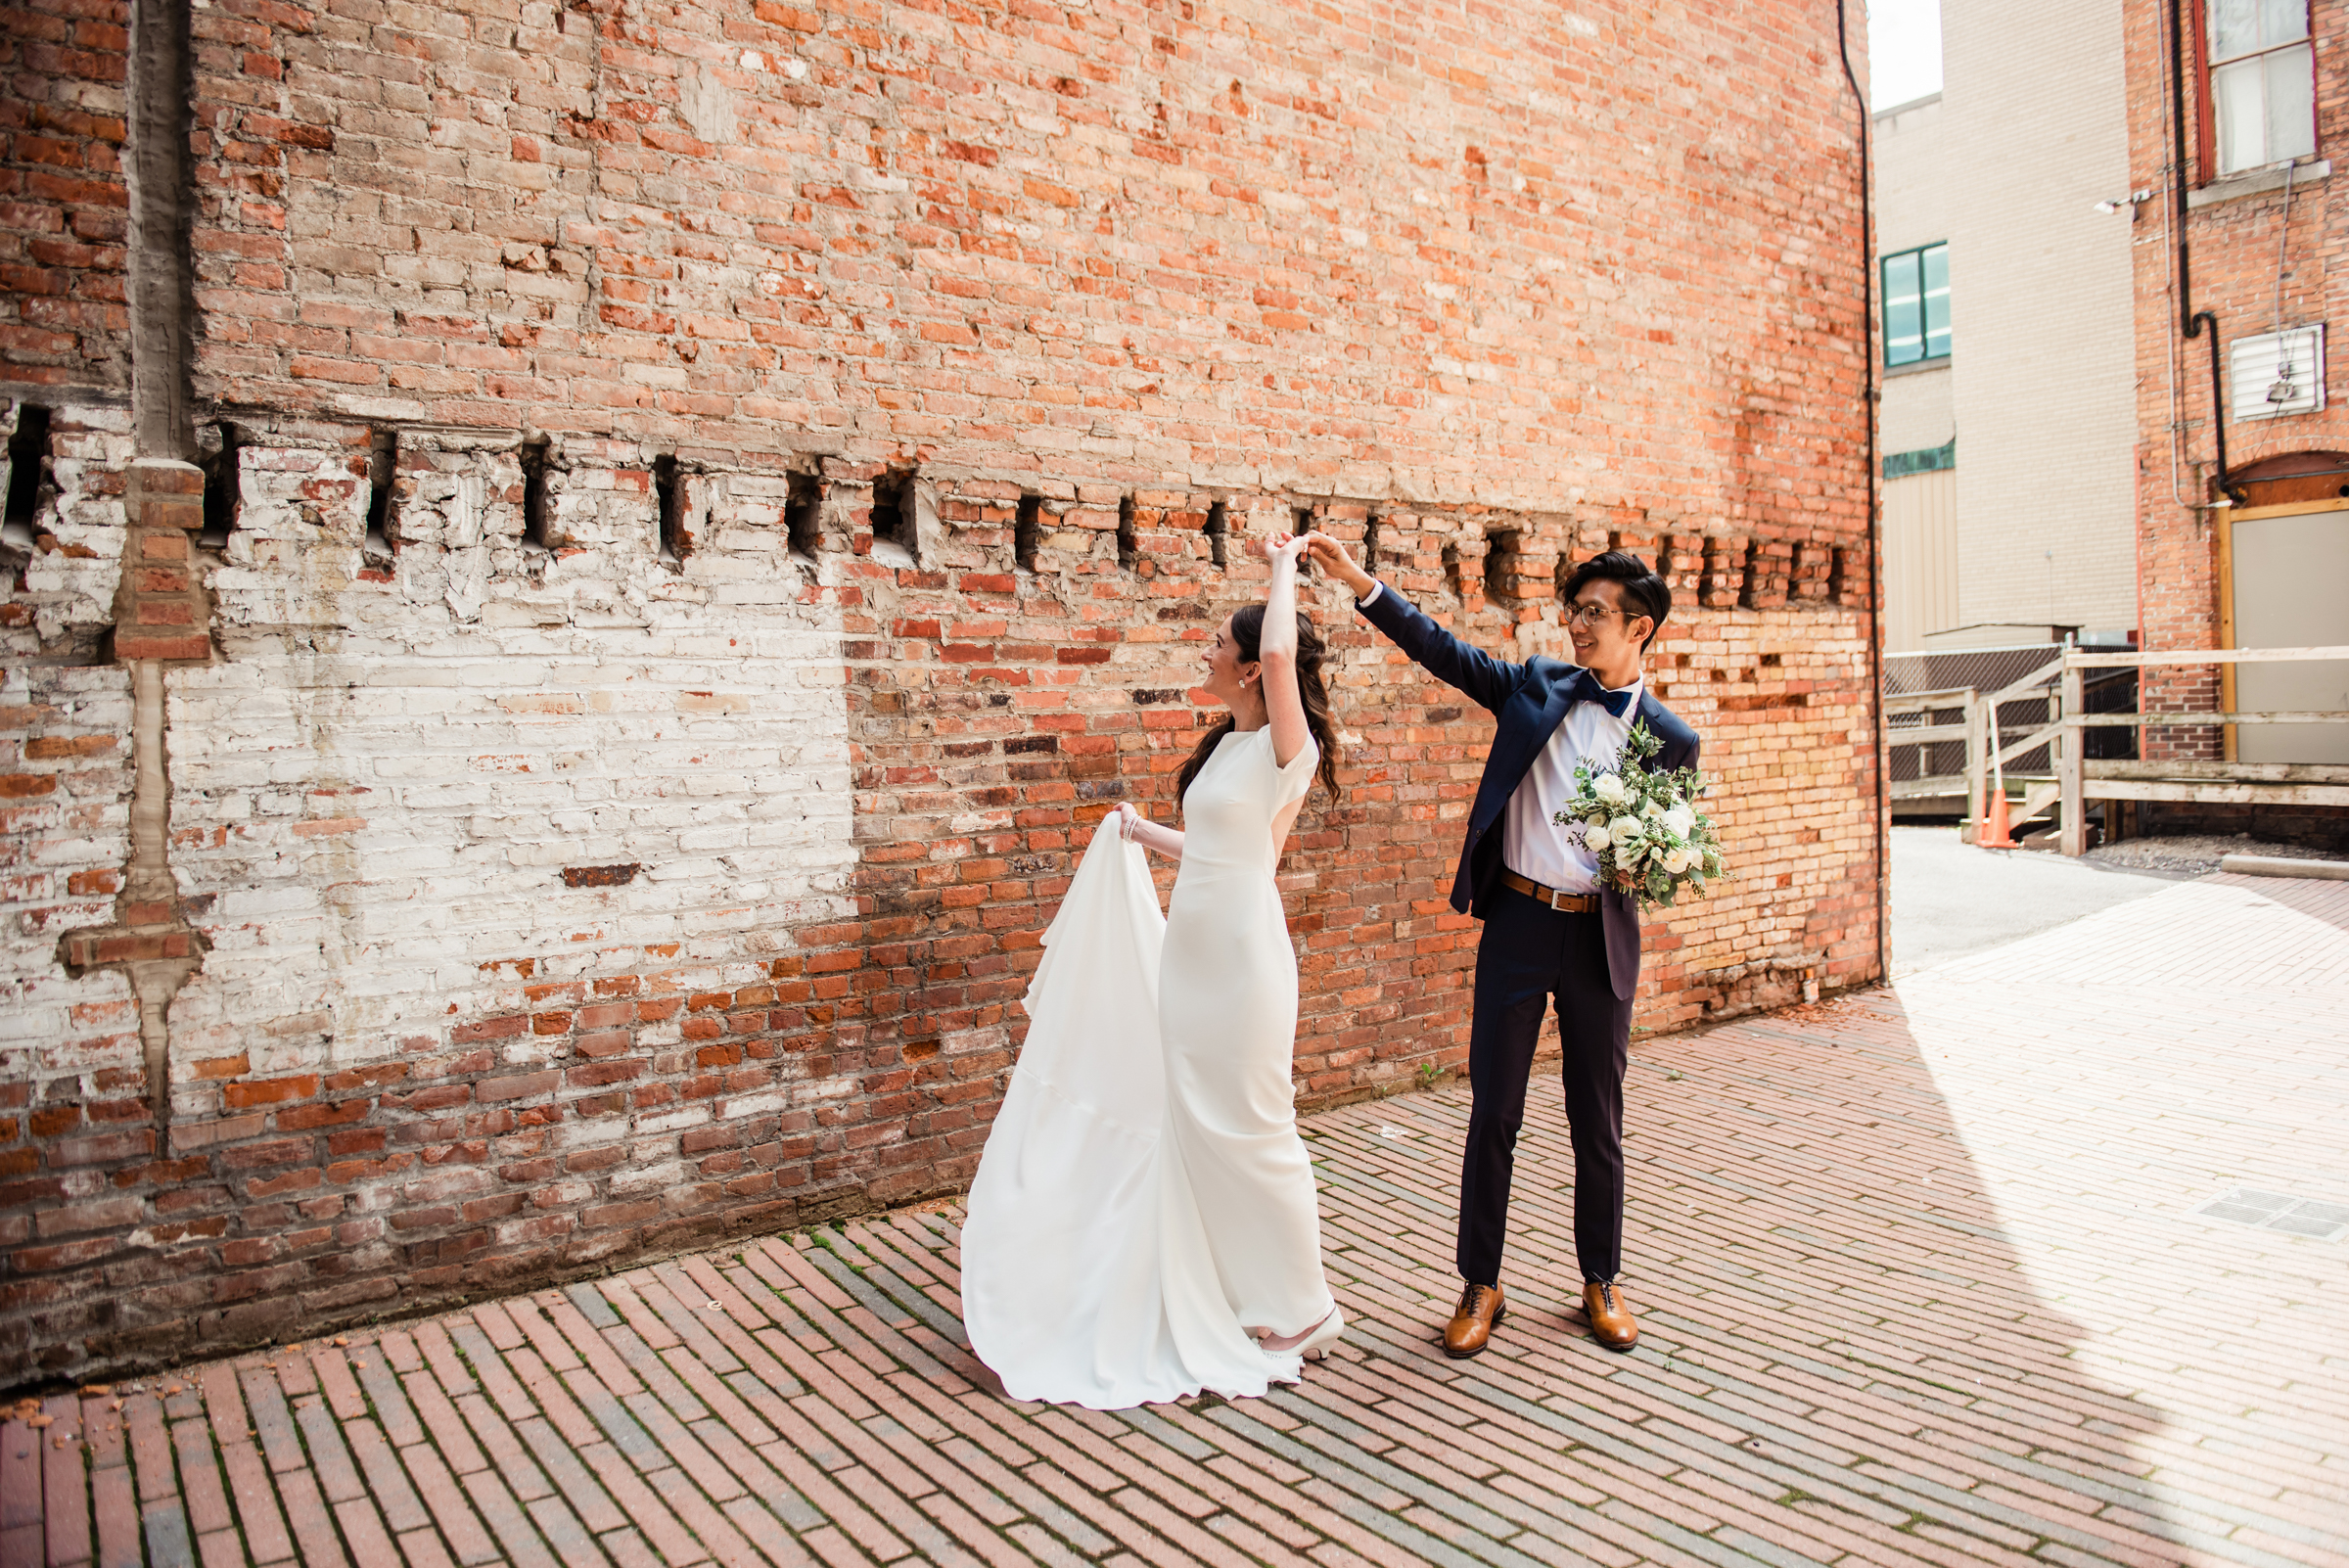 SKY_Armory_Syracuse_Wedding_JILL_STUDIO_Rochester_NY_Photographer_DSC_5398.jpg